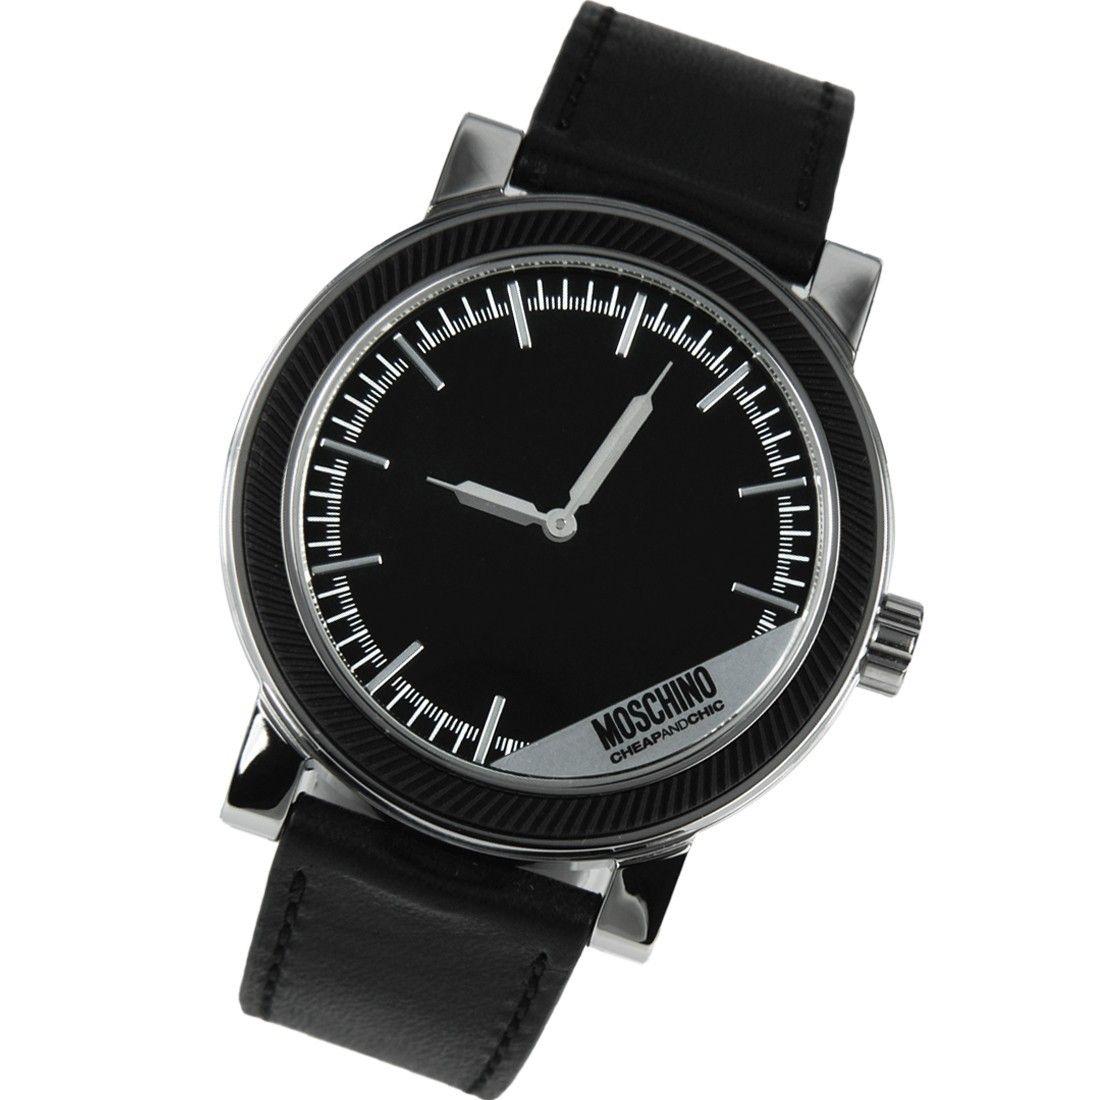 ac605a64ee6 Moschino Quartz Cheap and Chic Unit Square Watch MW0275 | low price | Square  watch, Moschino, Watches